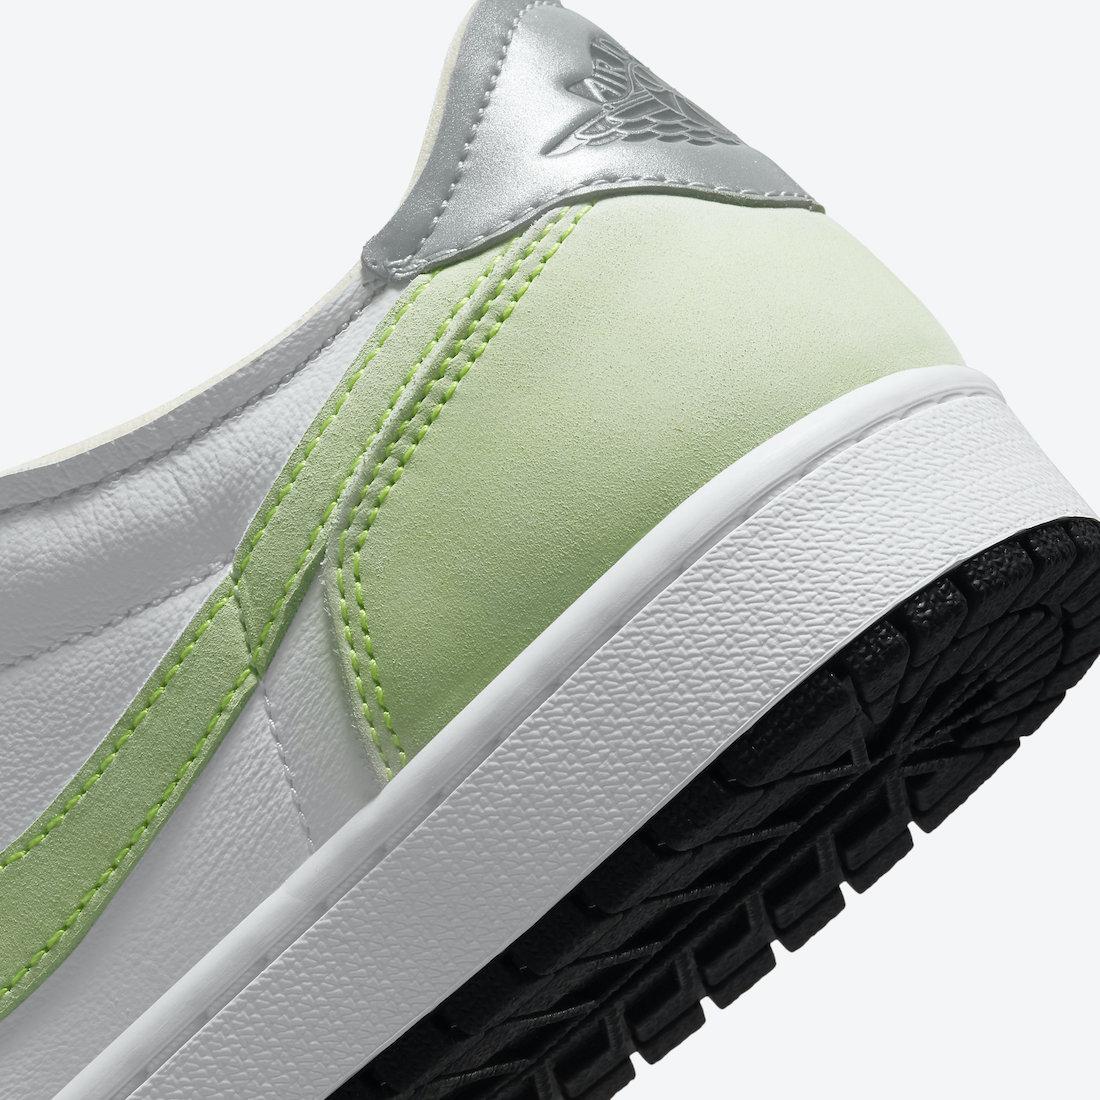 Air-Jordan-1-Low-OG-Ghost-Green-CZ0790-103-Release-Date-7